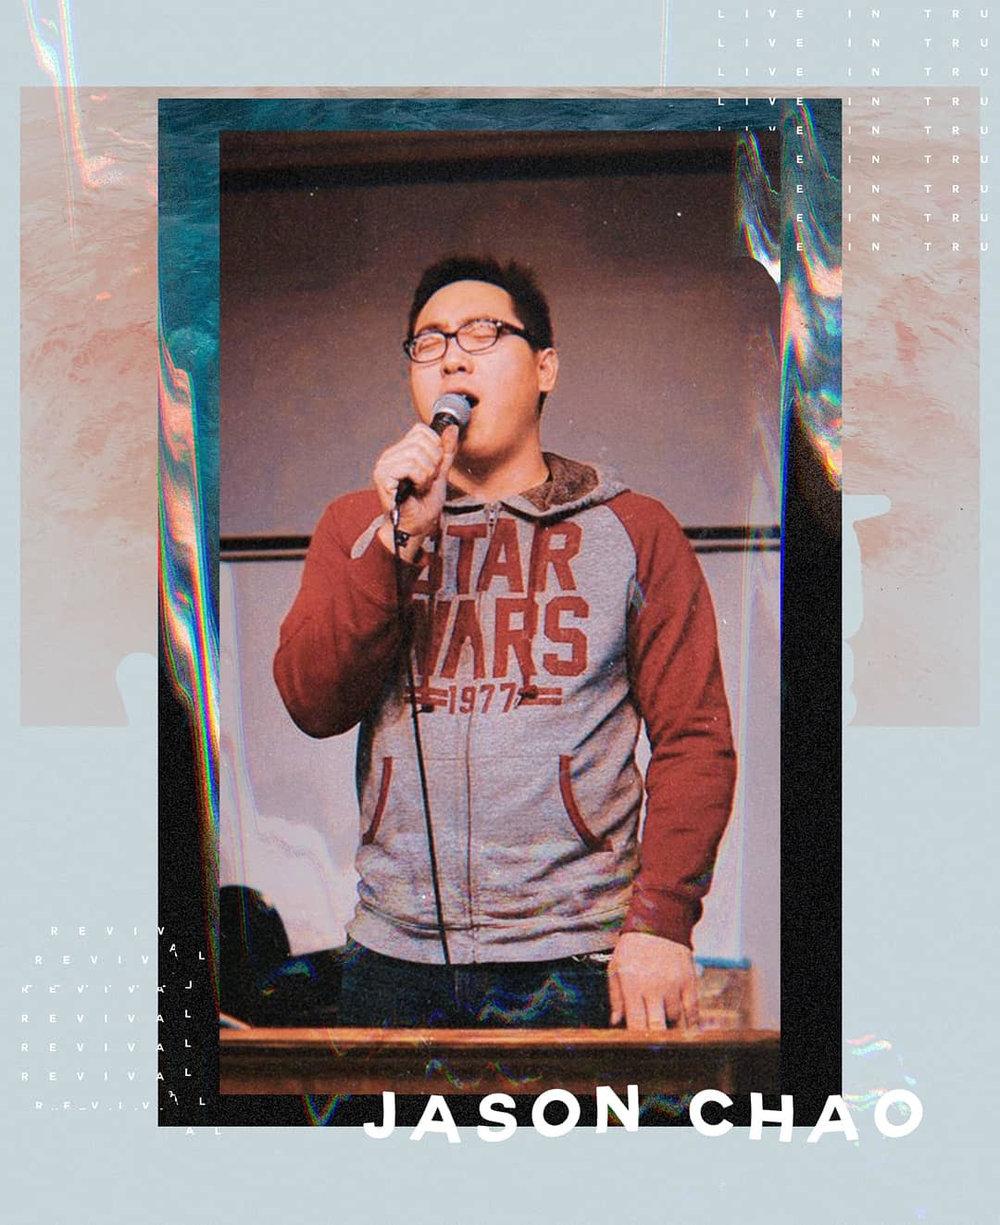 Jason Chao.jpg